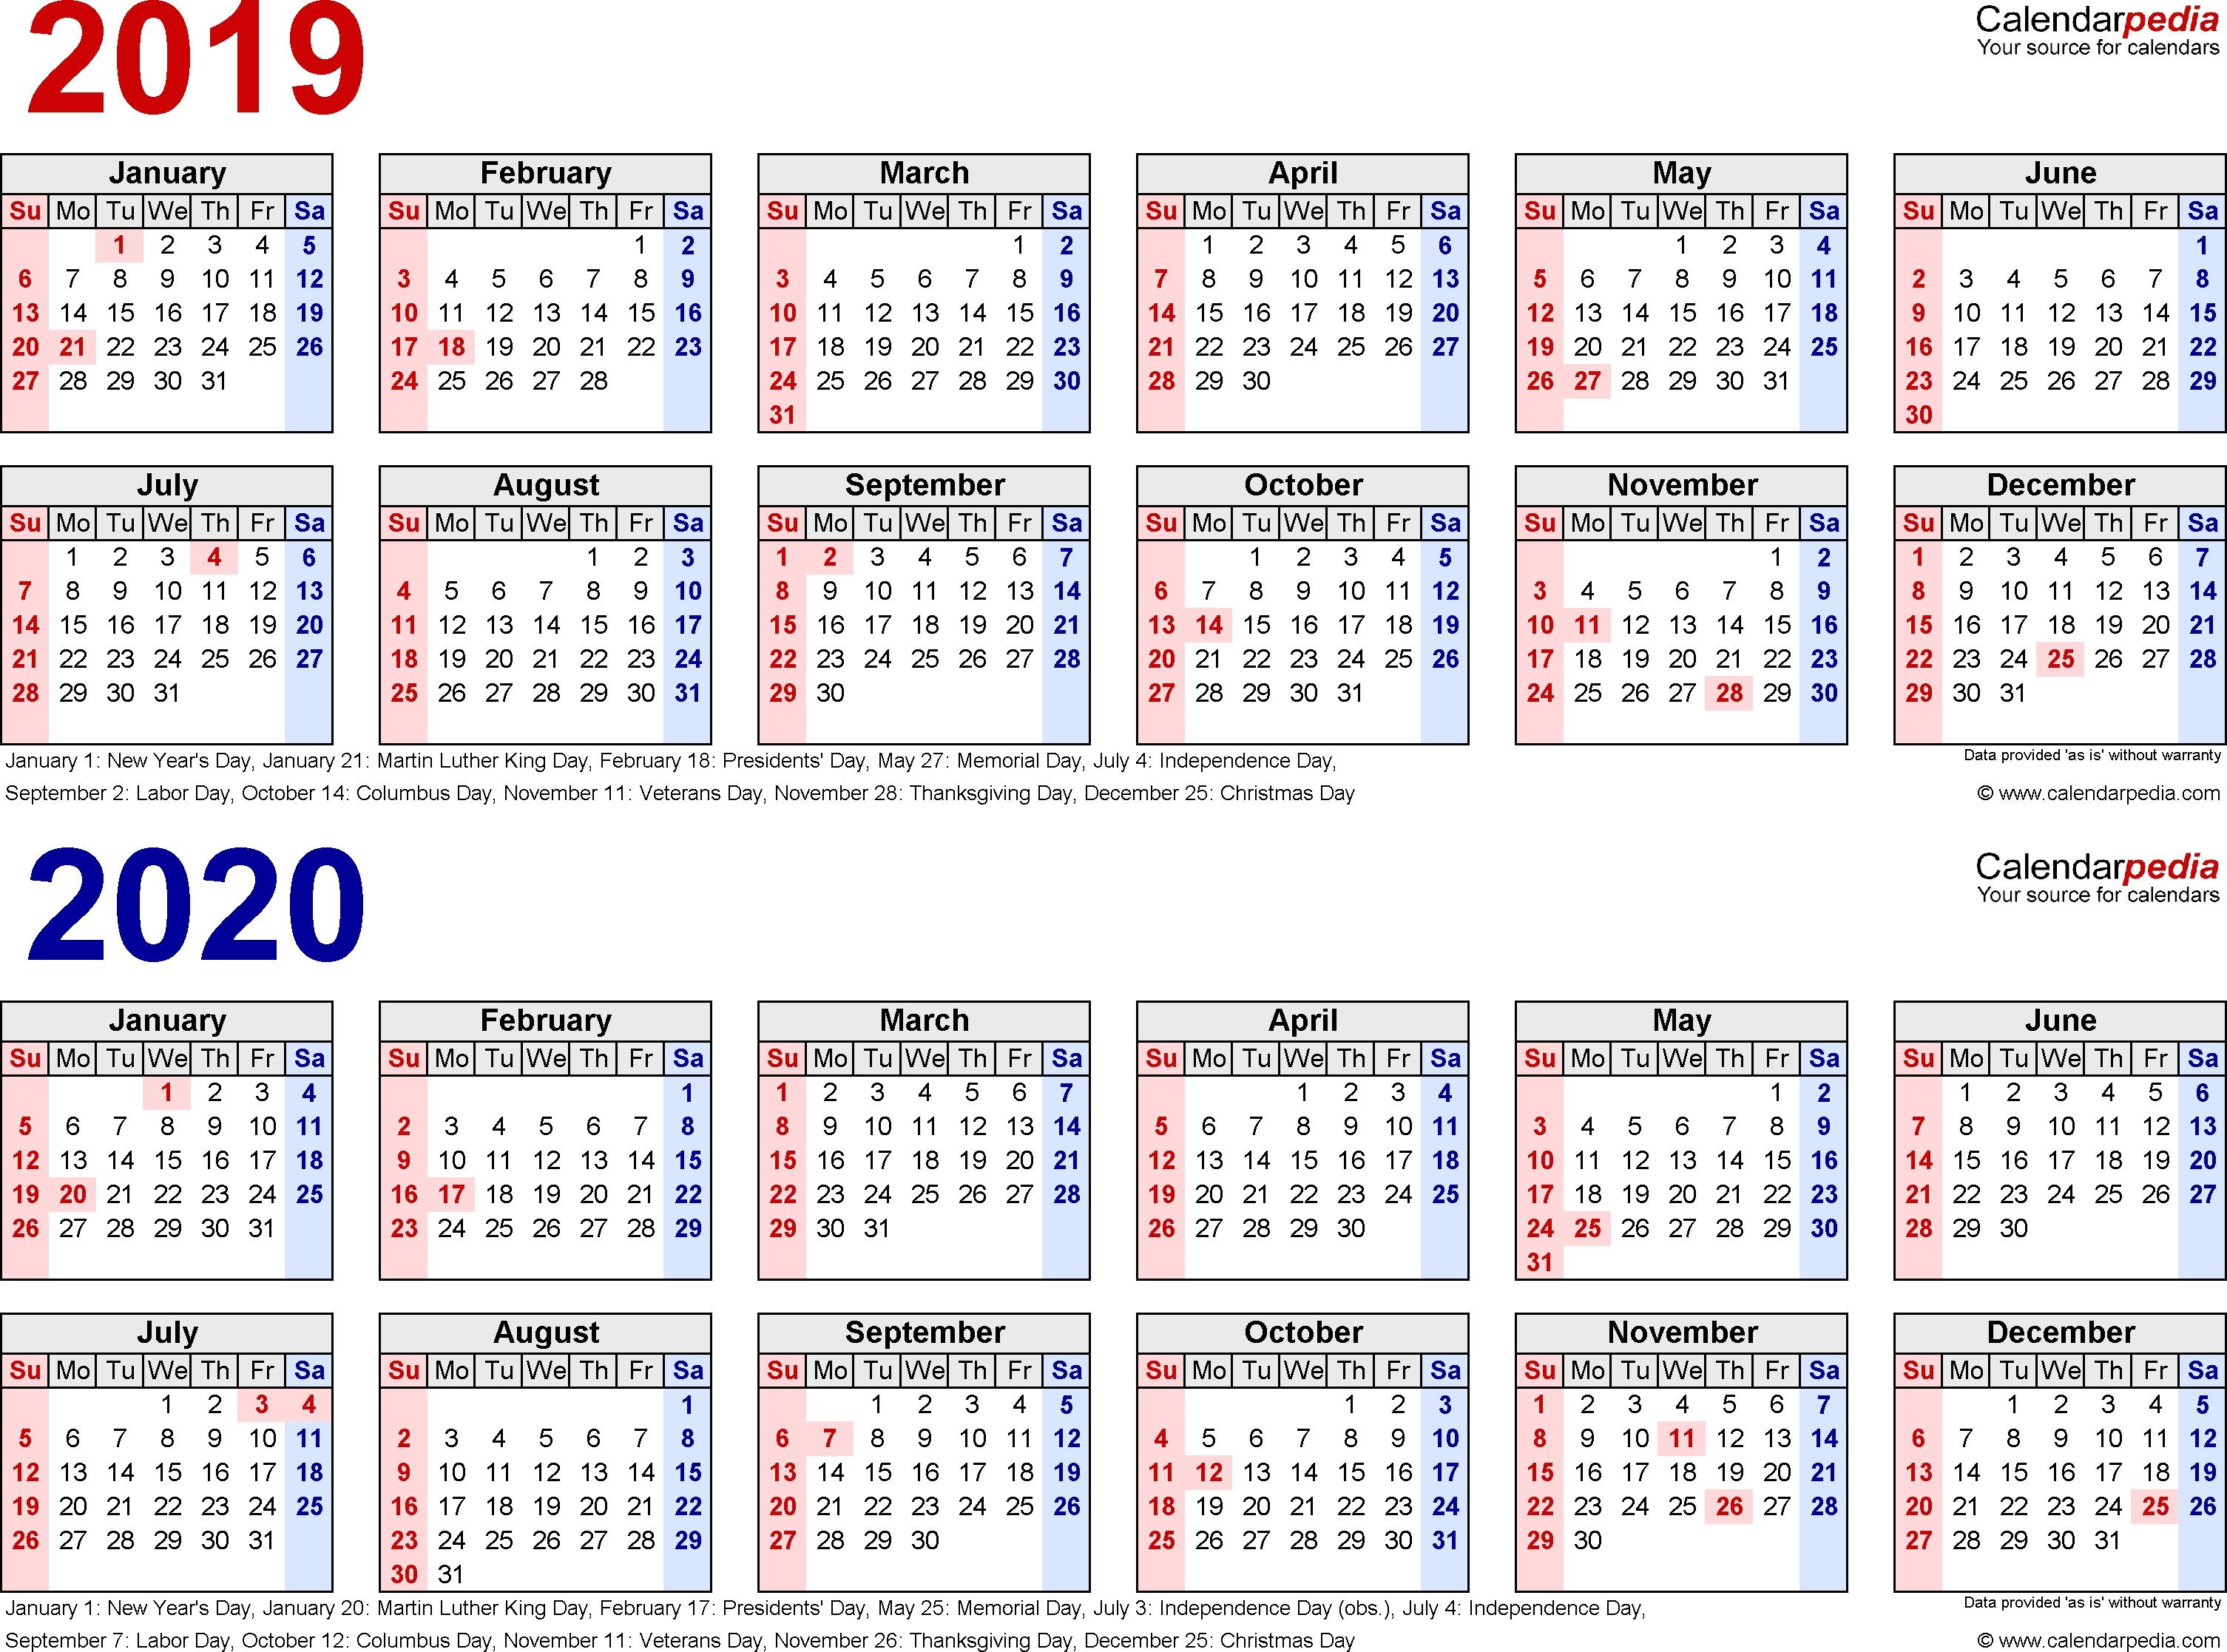 2019-2020 Calendar - Free Printable Two-Year Pdf Calendars-Printable 2 Page Monthly Calendar 2020 Free